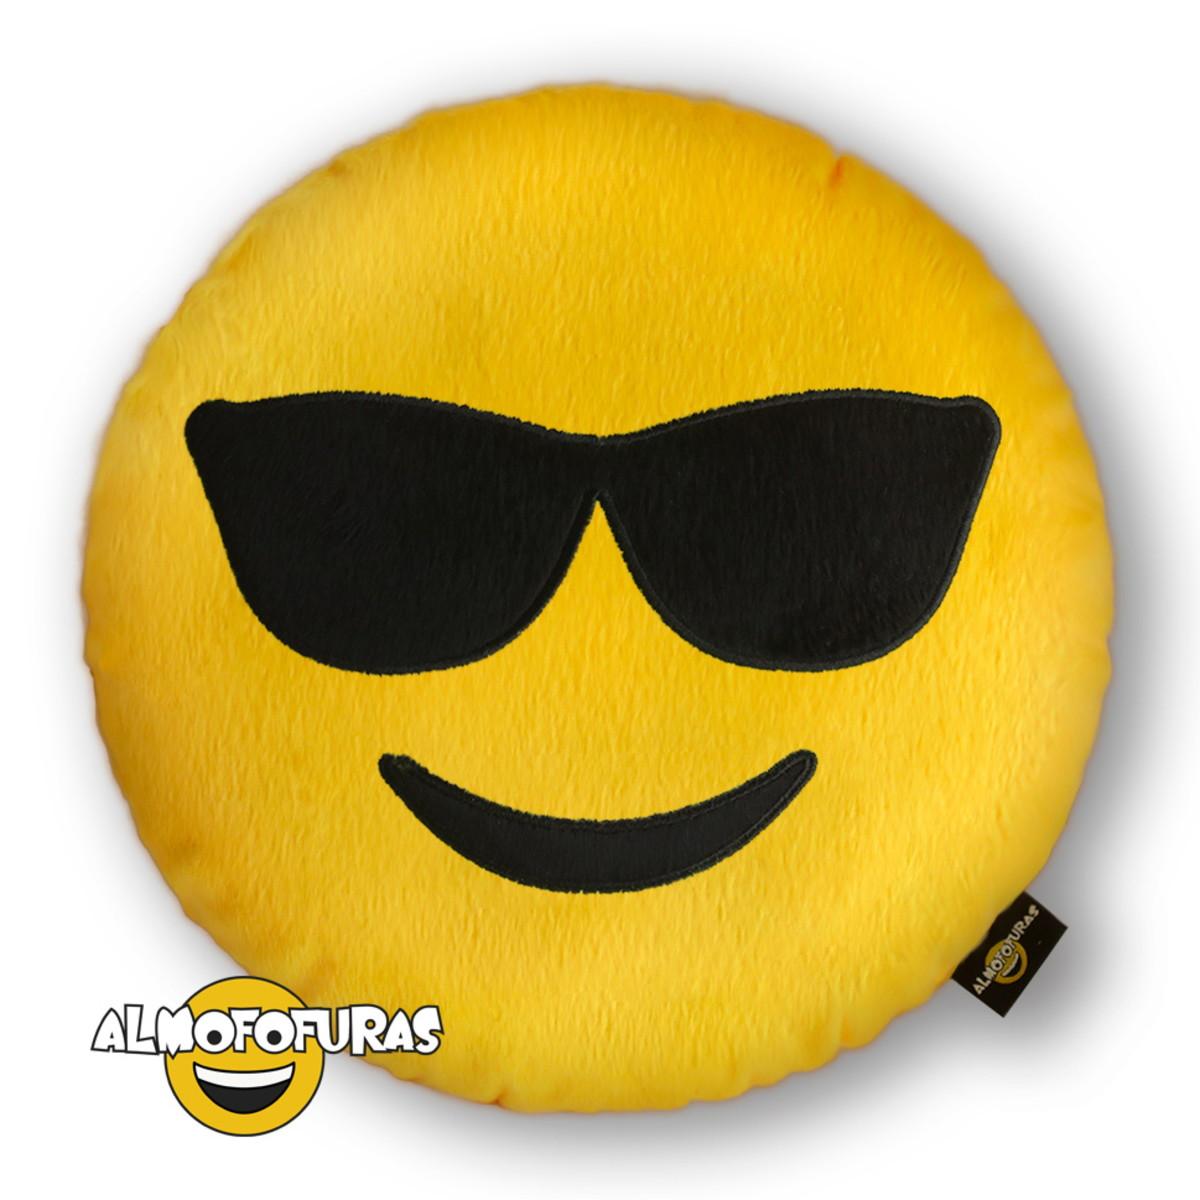 Almofada Emoji Pelúcia Bordada Whatsapp Óculos de Sol no Elo7 ... bbc7c7e3ff